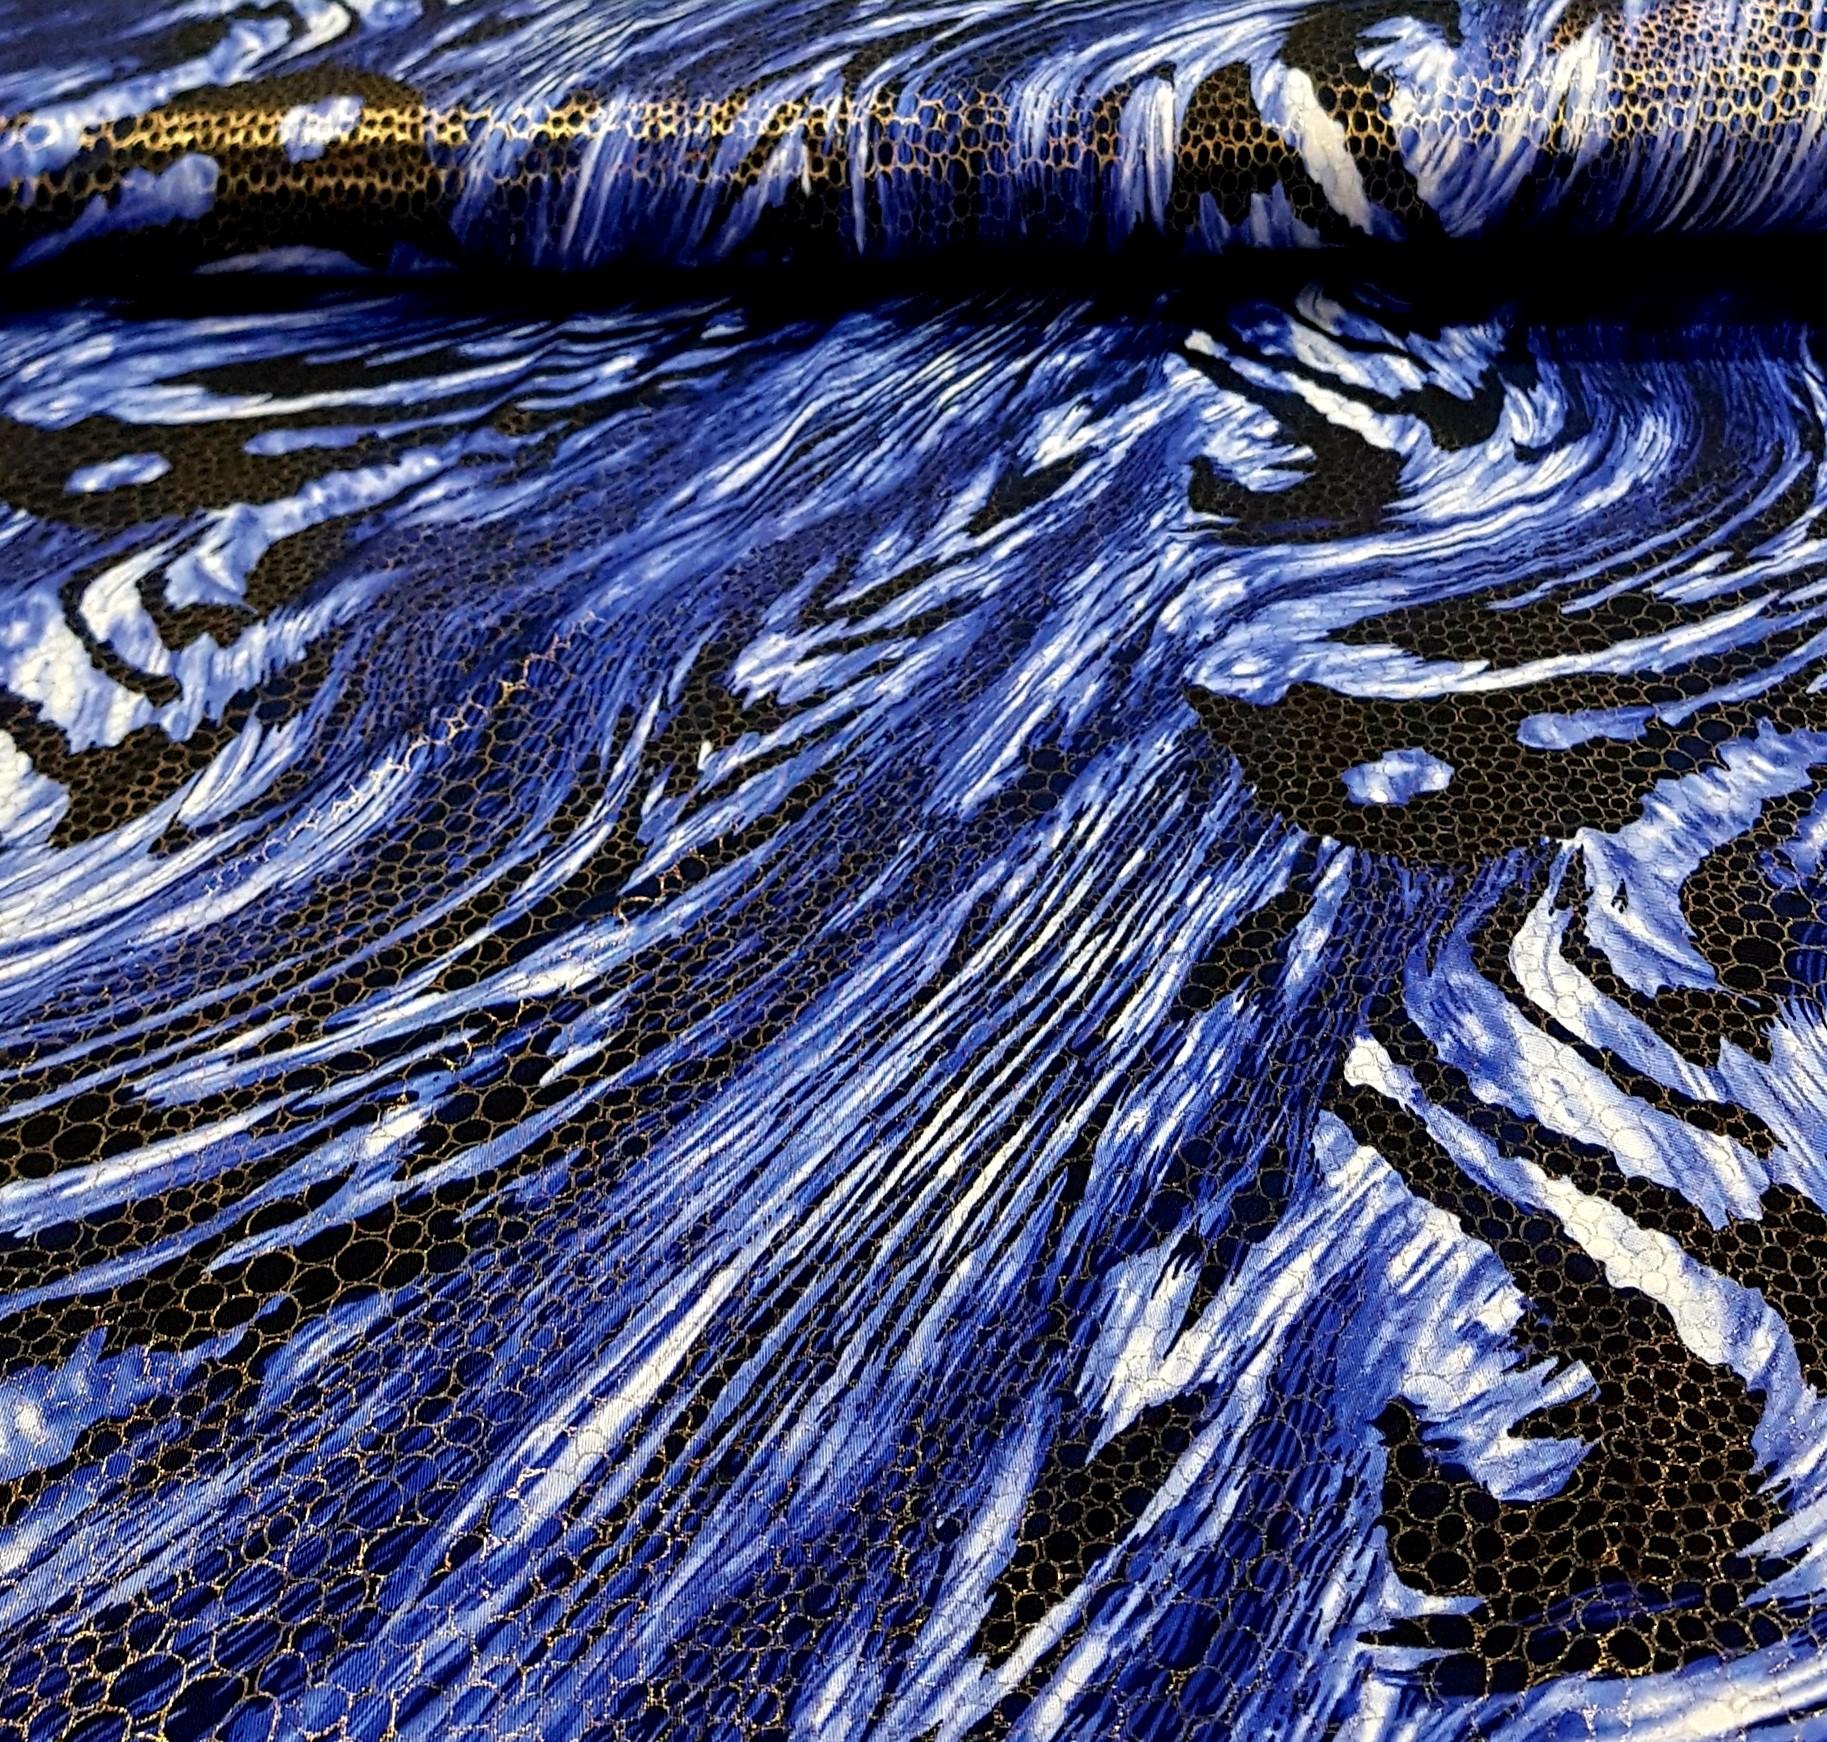 bedruktelycragoudenglittersblauwzwart